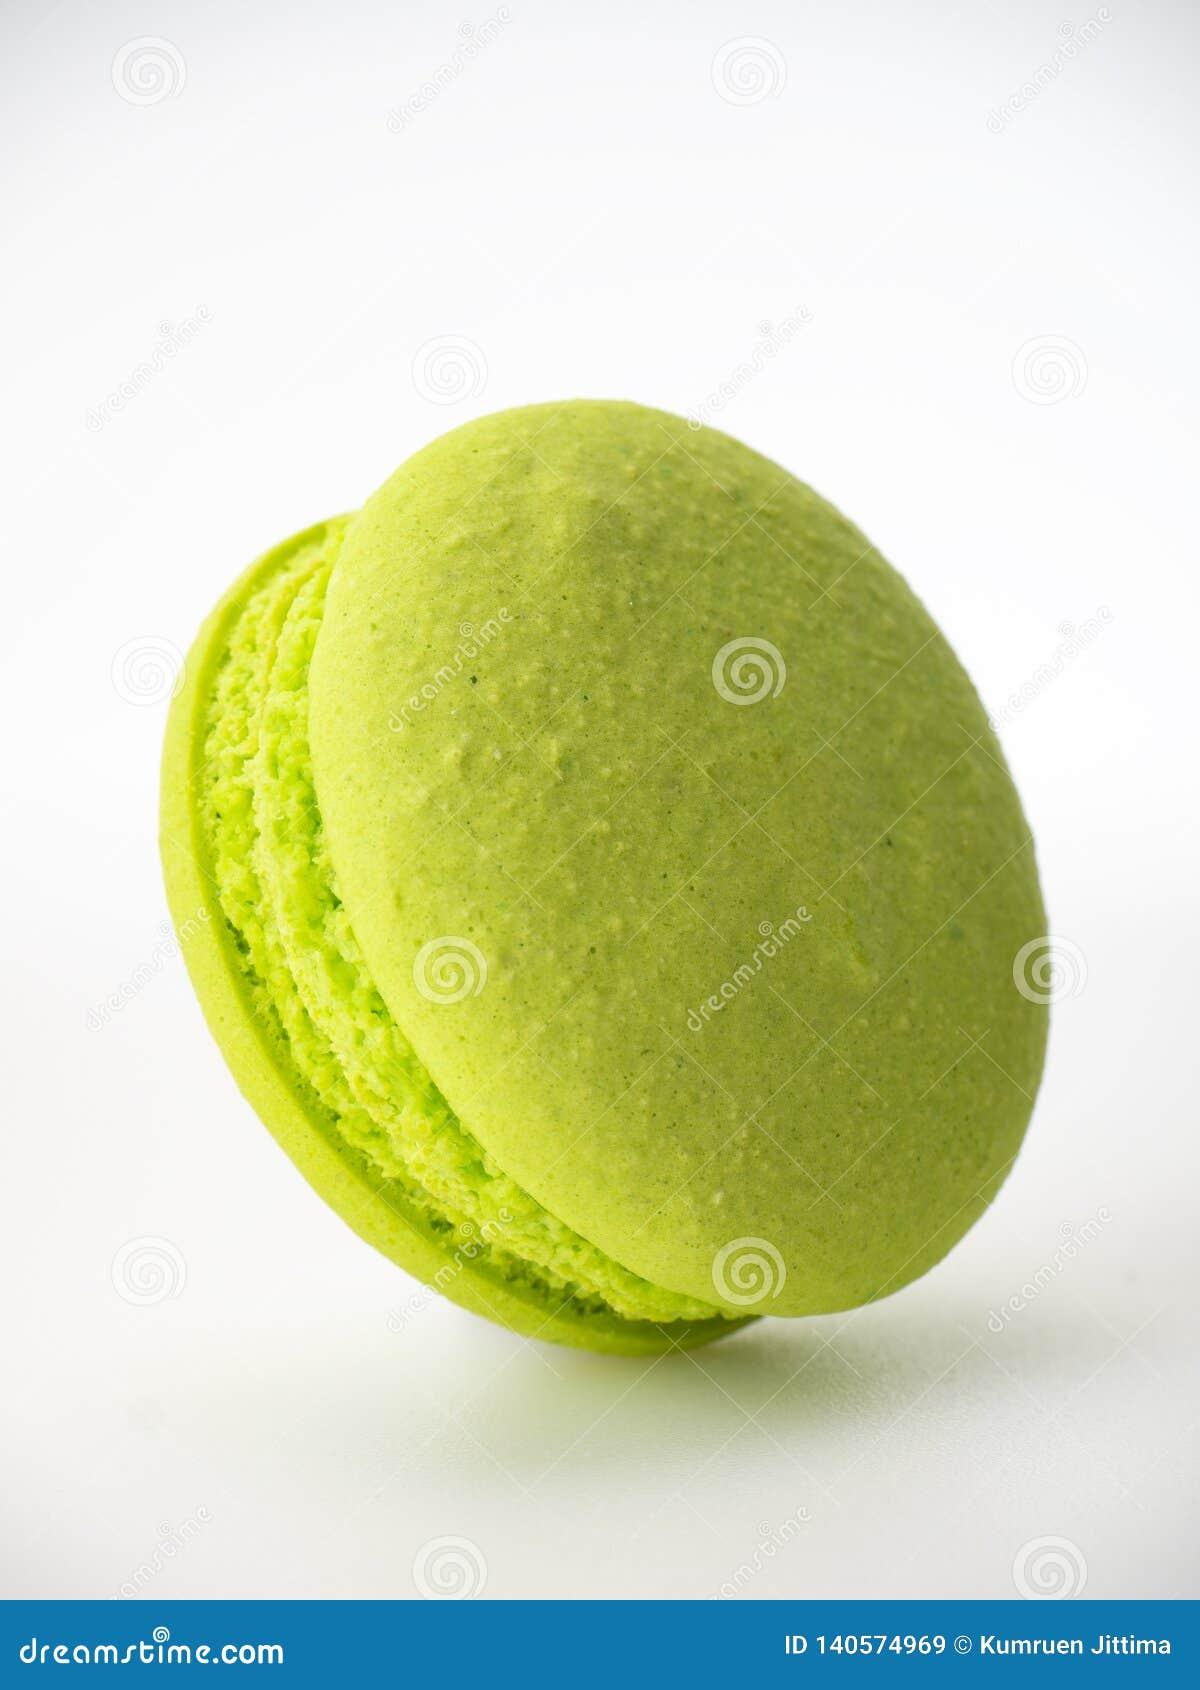 Sweet hazelnut Green macarons on white